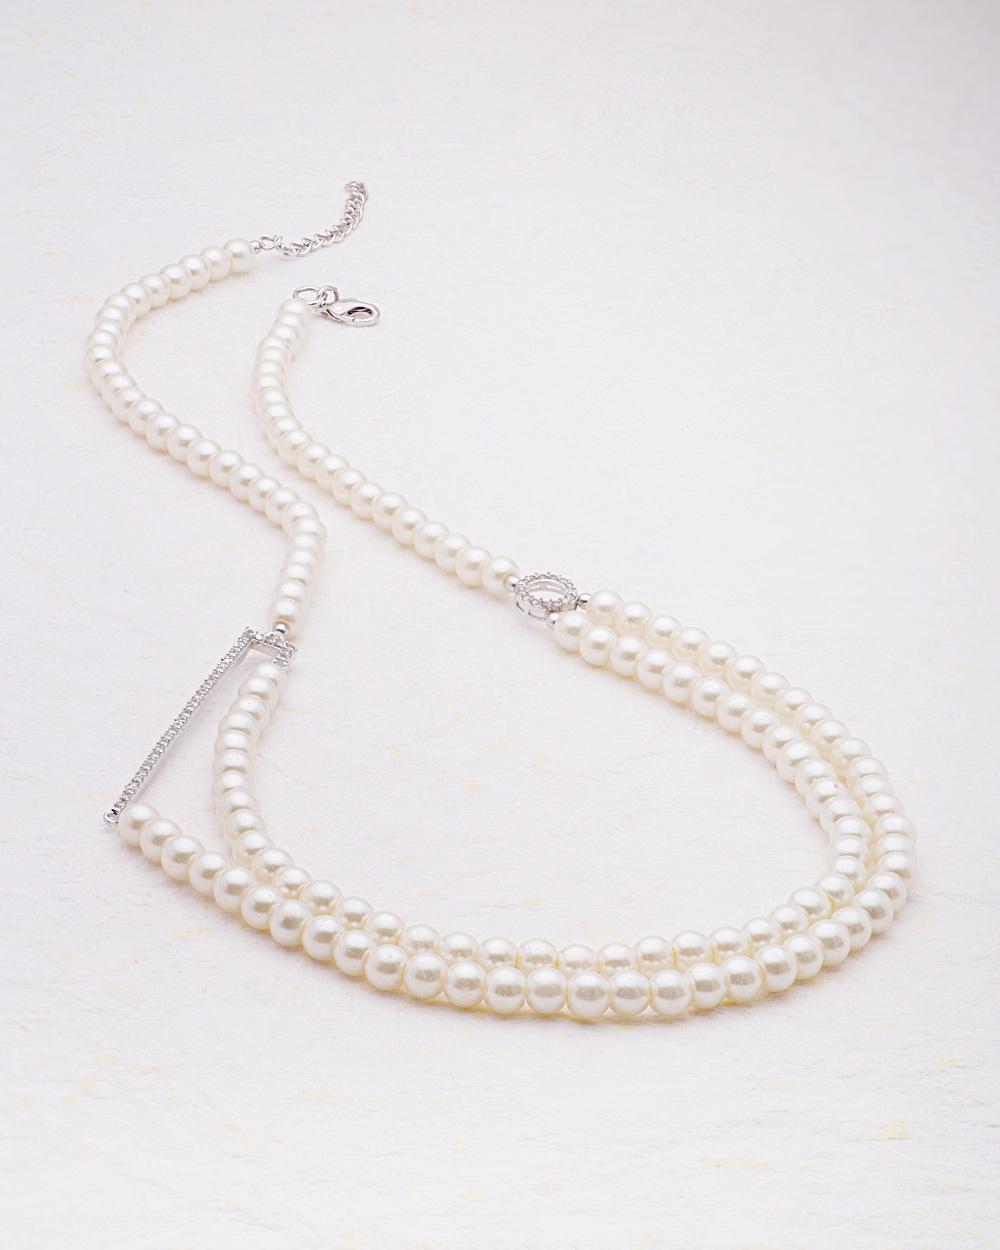 Buy cz embellished side pendant pearl necklace from pearl galleria cz embellished side pendant pearl necklace from pearl galleria mozeypictures Choice Image